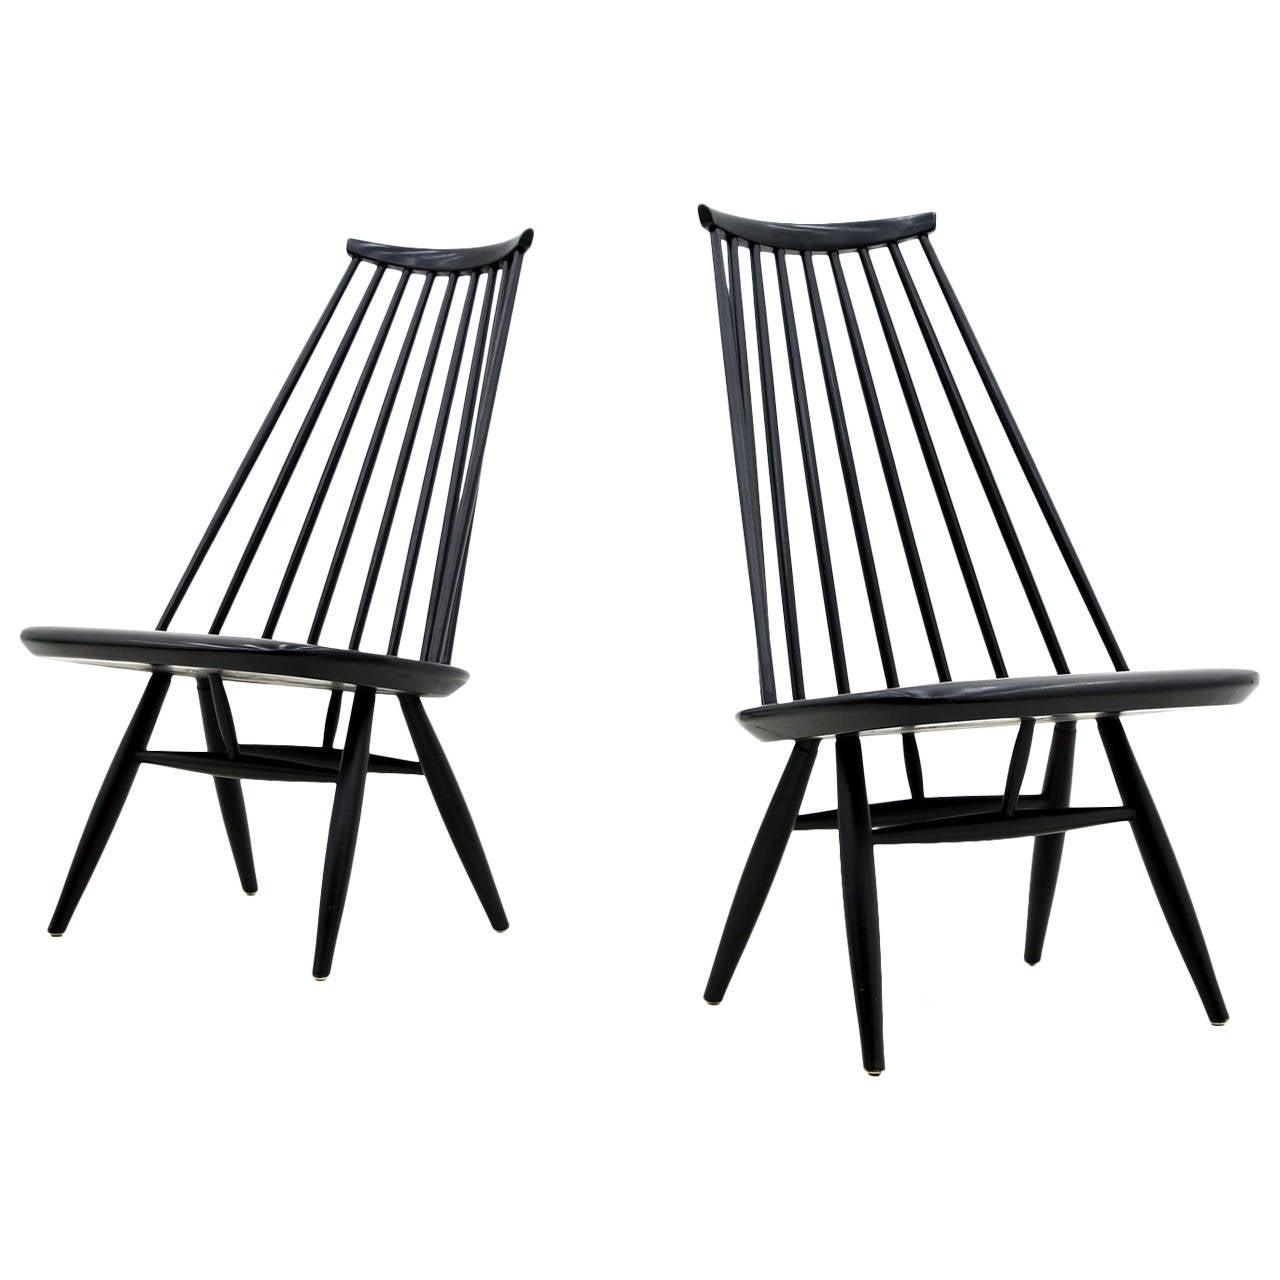 Pair of Mademoiselle Lounge Chairs by Ilmari Tapiovaara for Asko, Finland, 1956